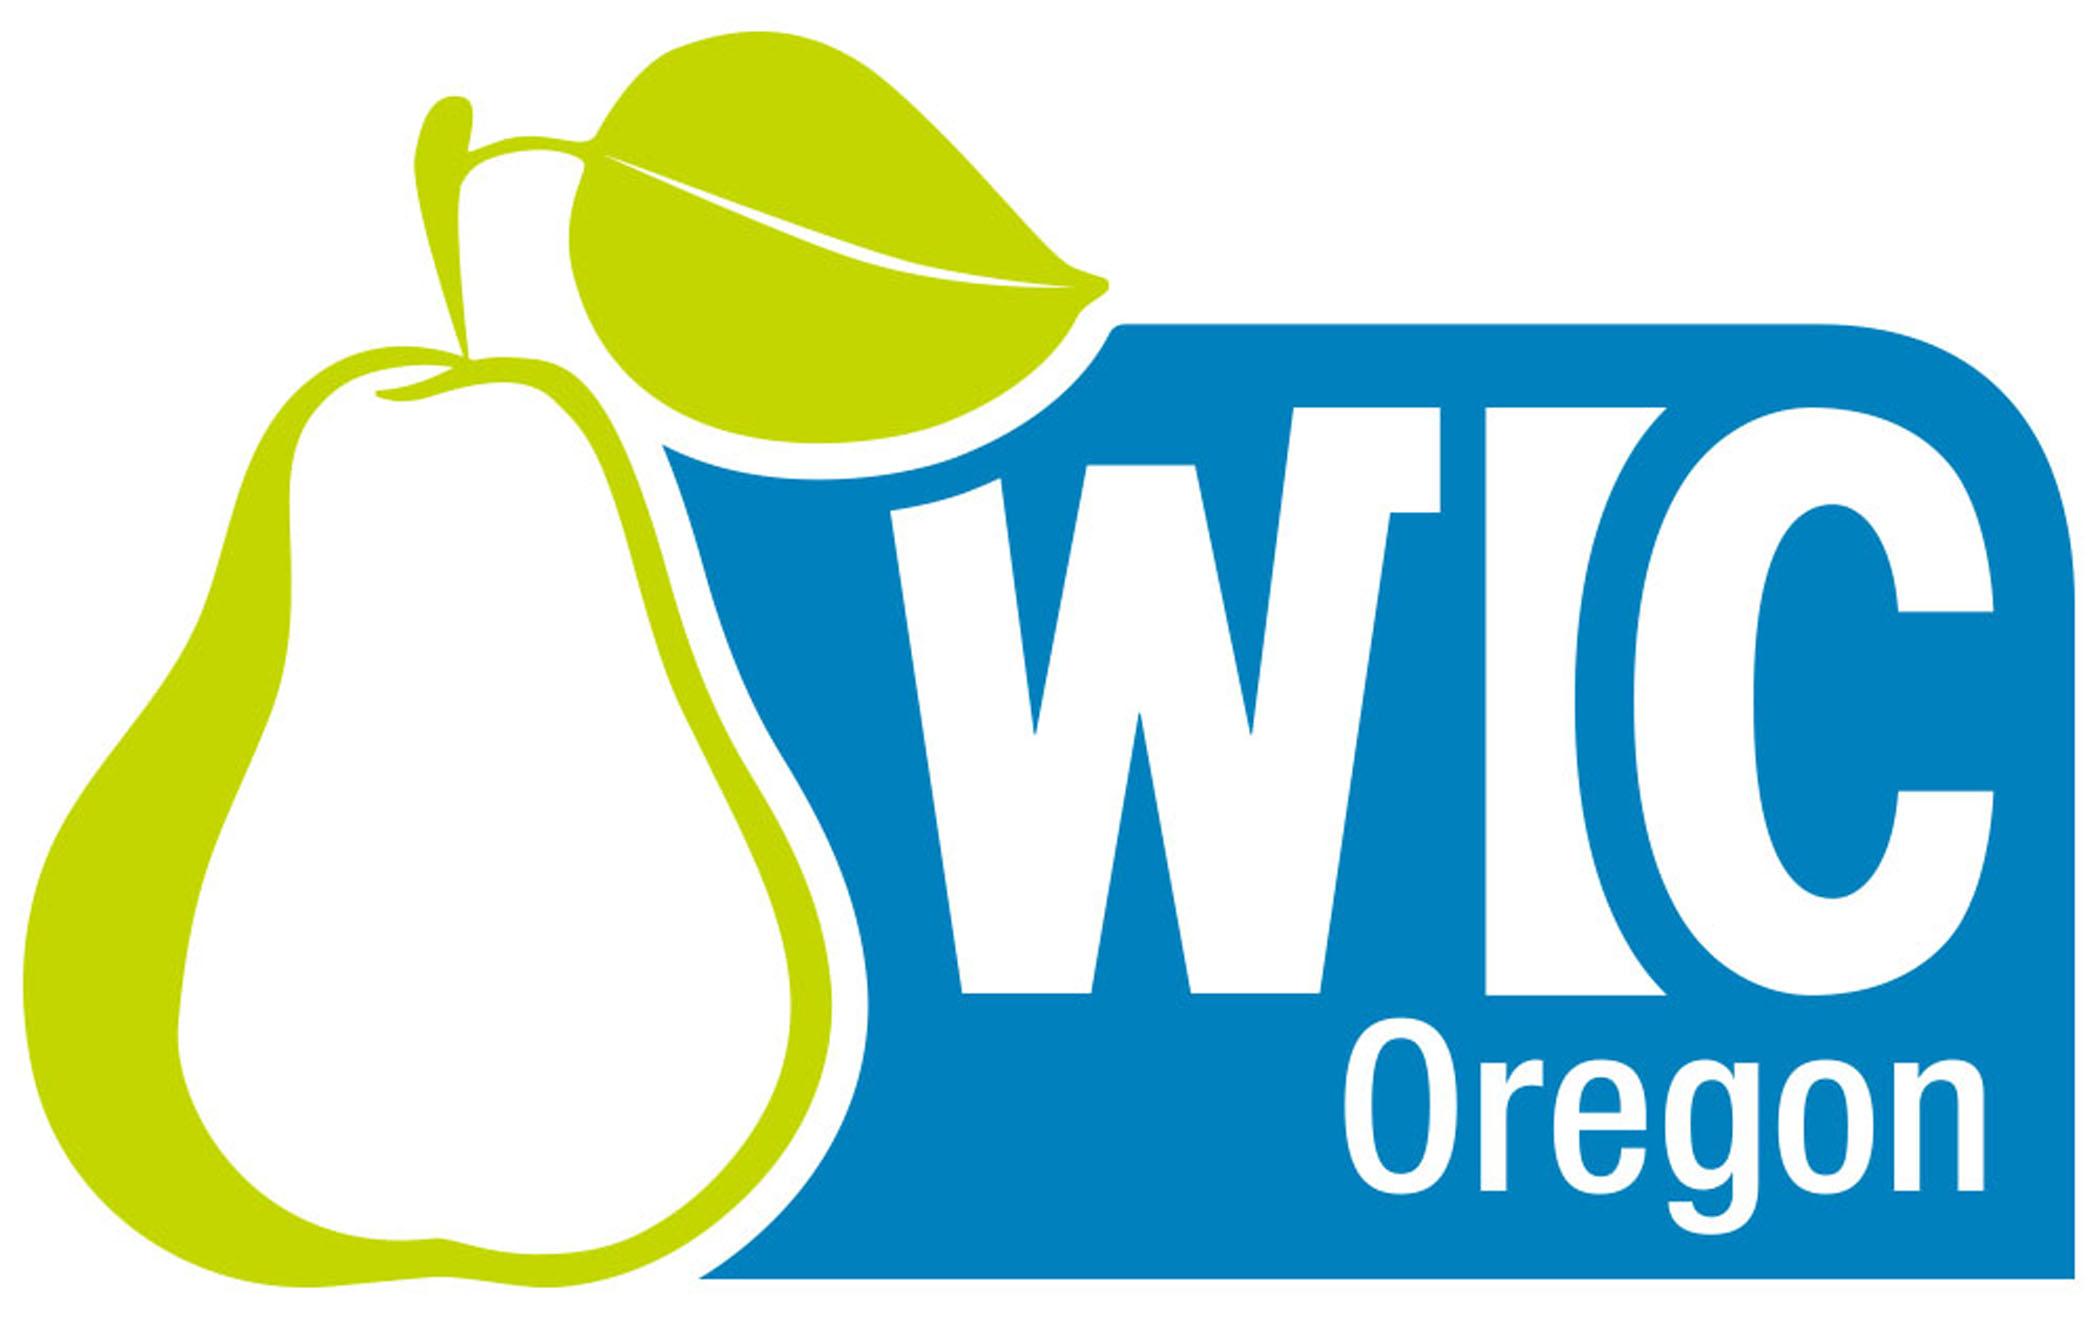 Oregon WIC color logo high resolution